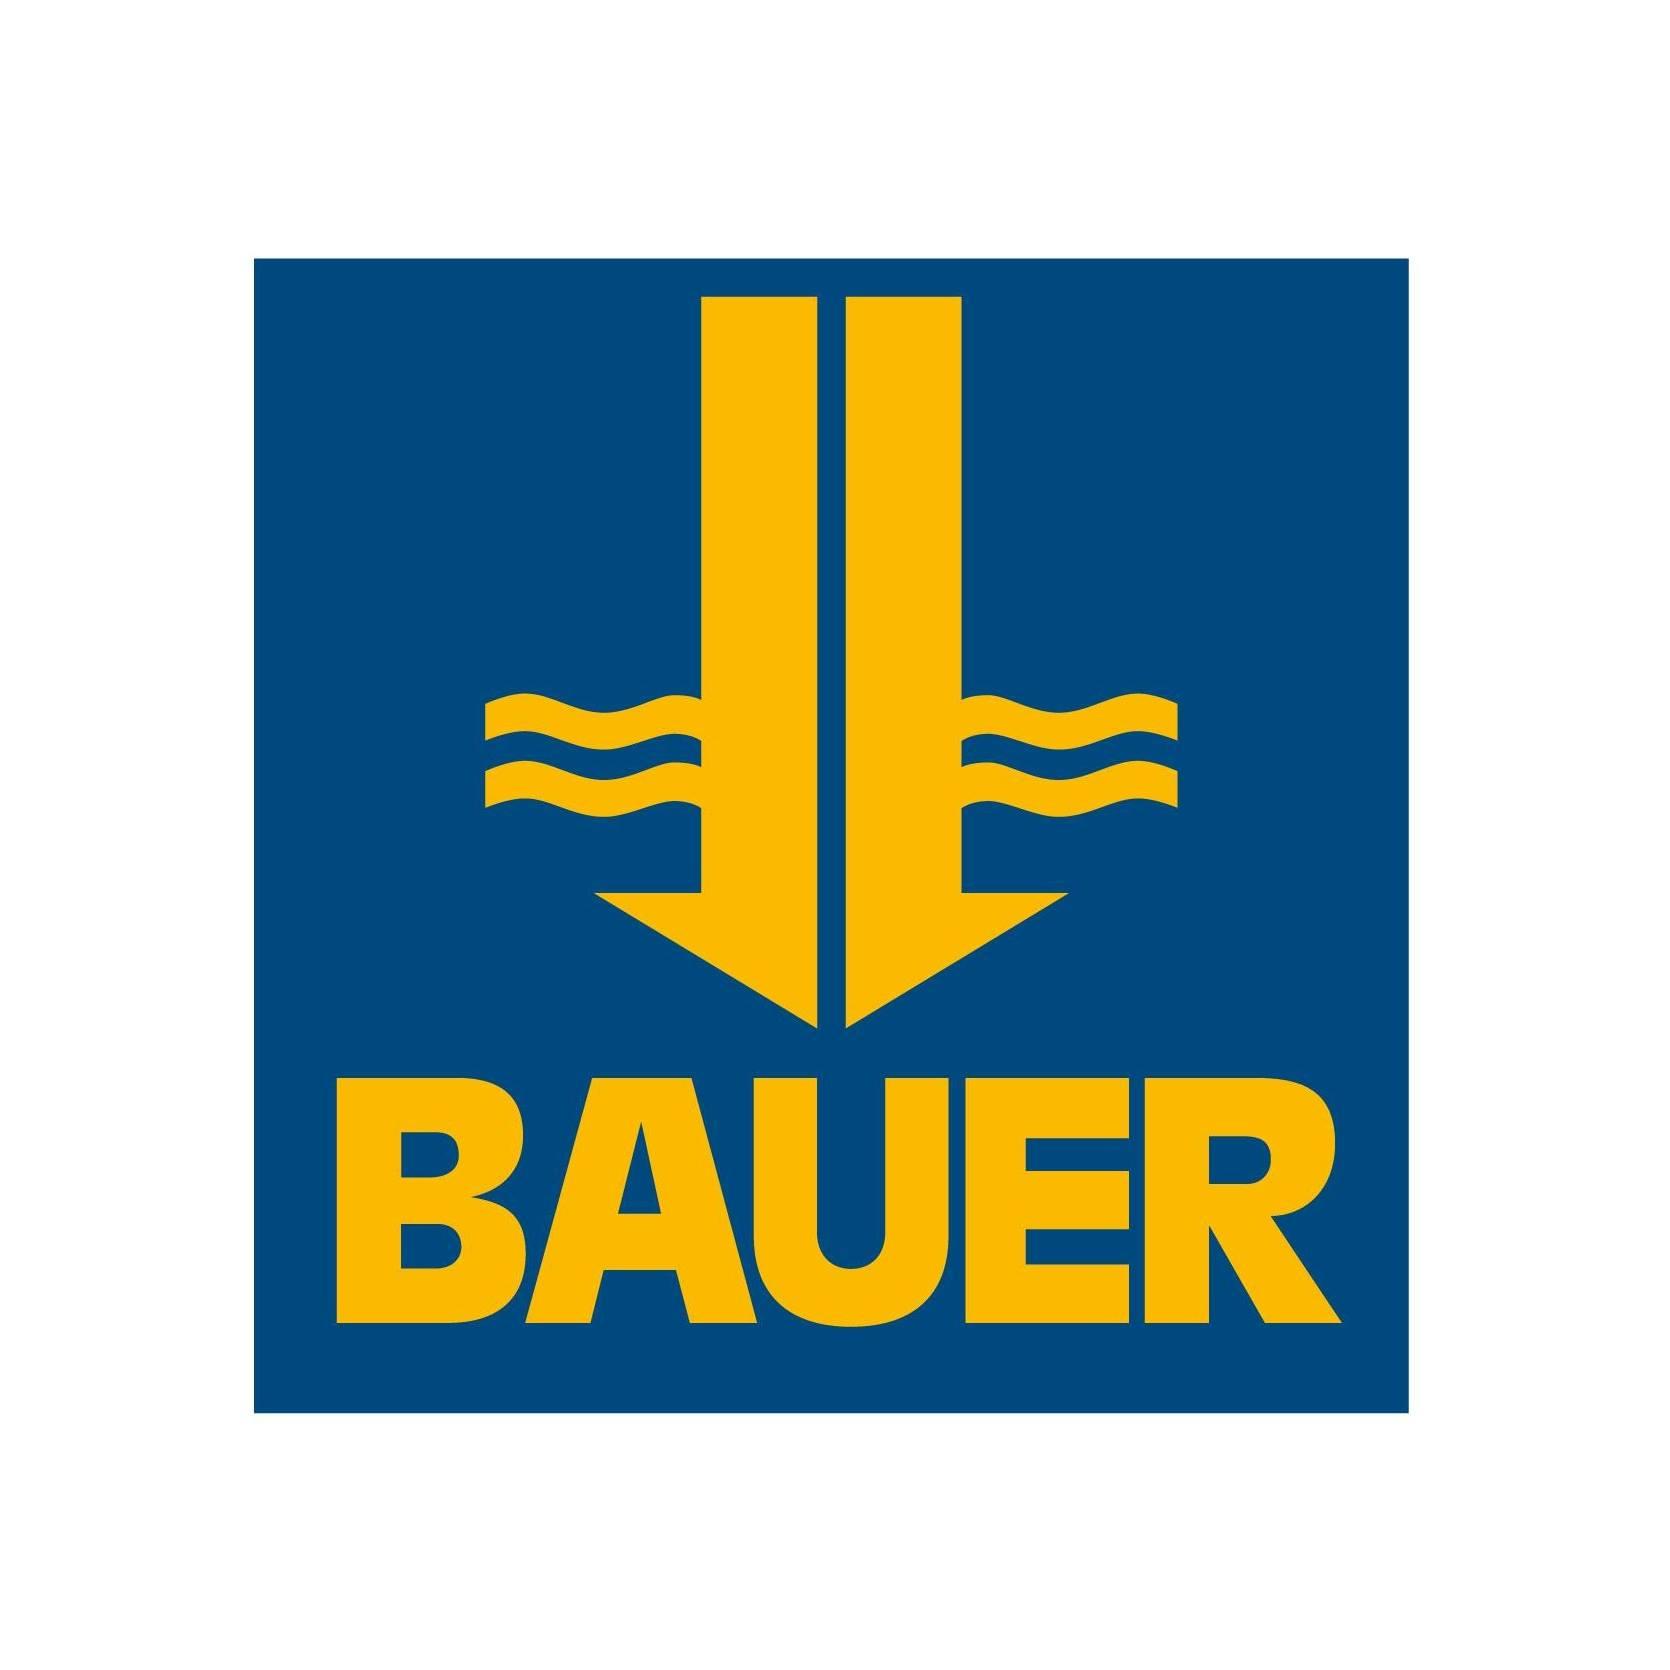 Bauer Equipment Gulf FZE